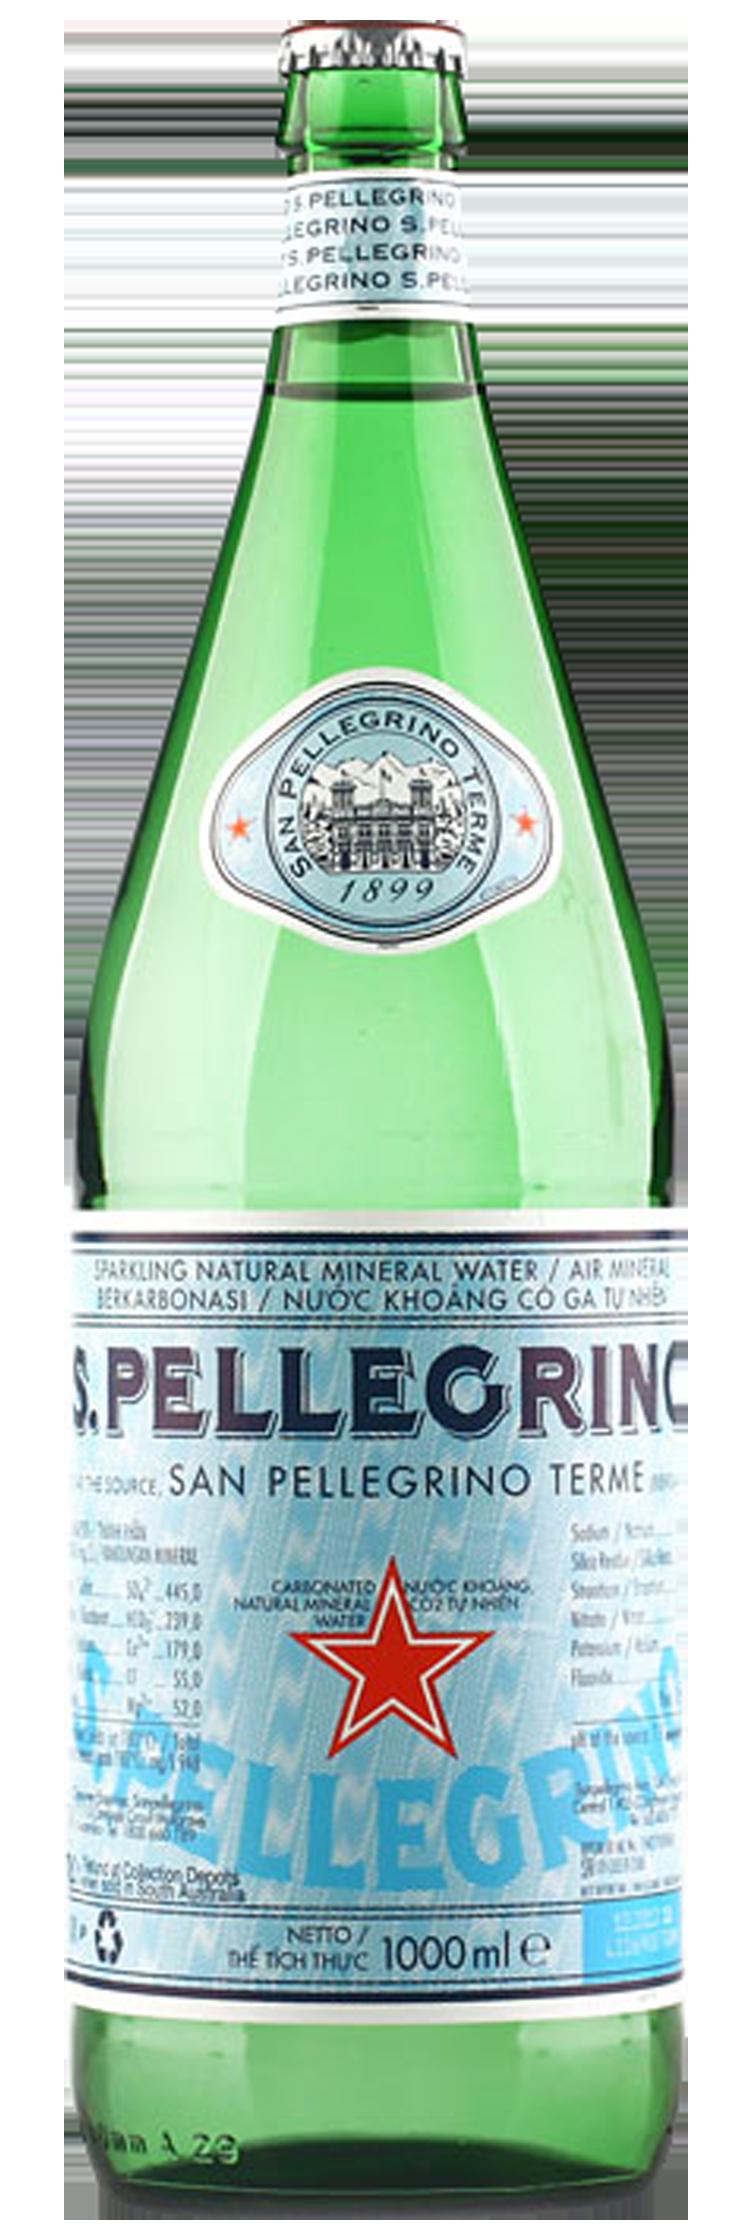 San Pellegrino Sparkling Mineral Water 12 x 750ml.